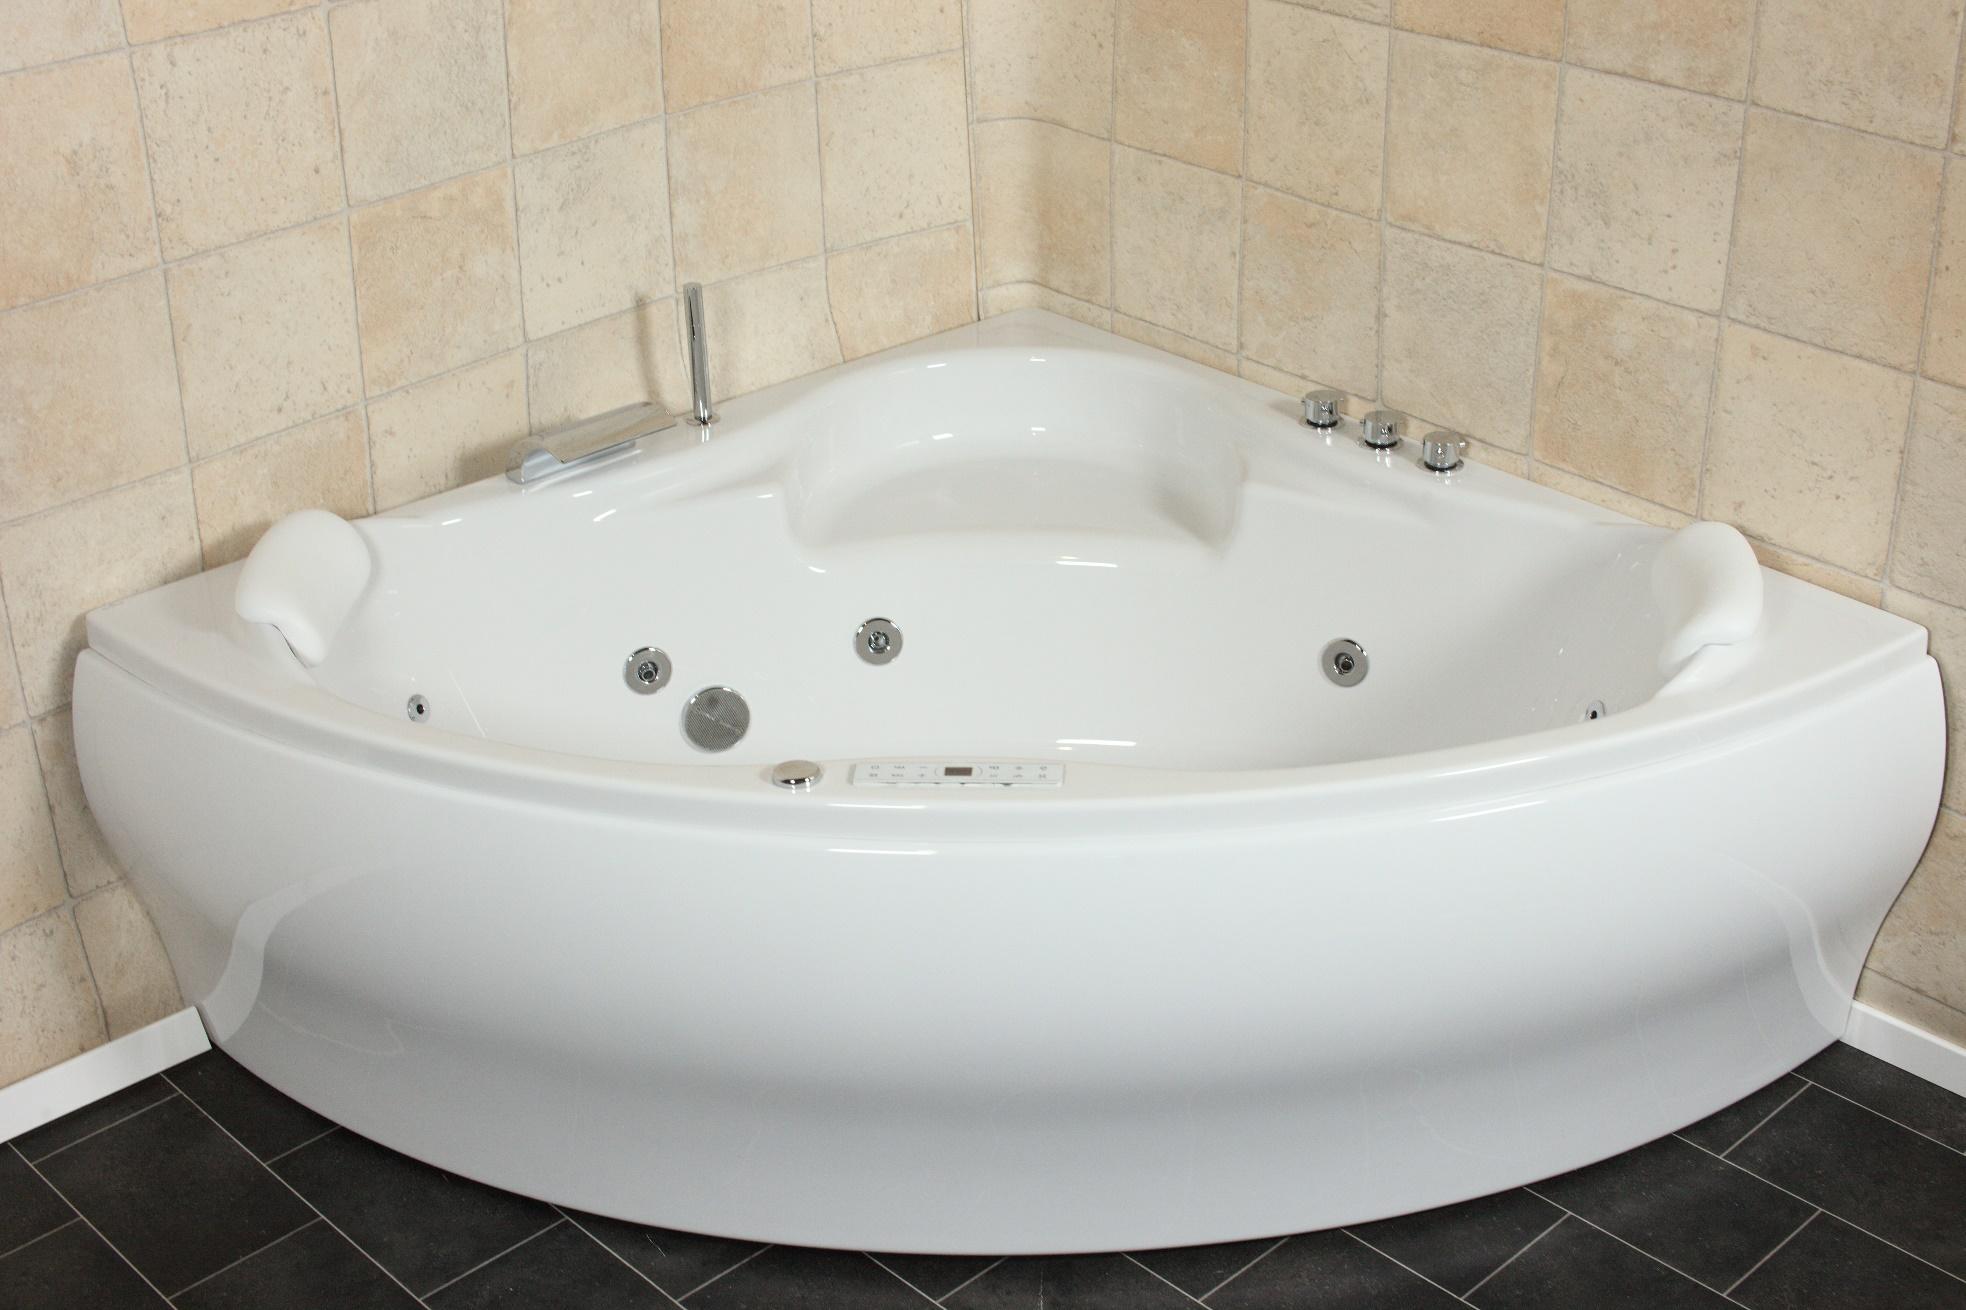 whirlpool badewanne 24 massage düsen heizung ozon led radio tv, Hause ideen